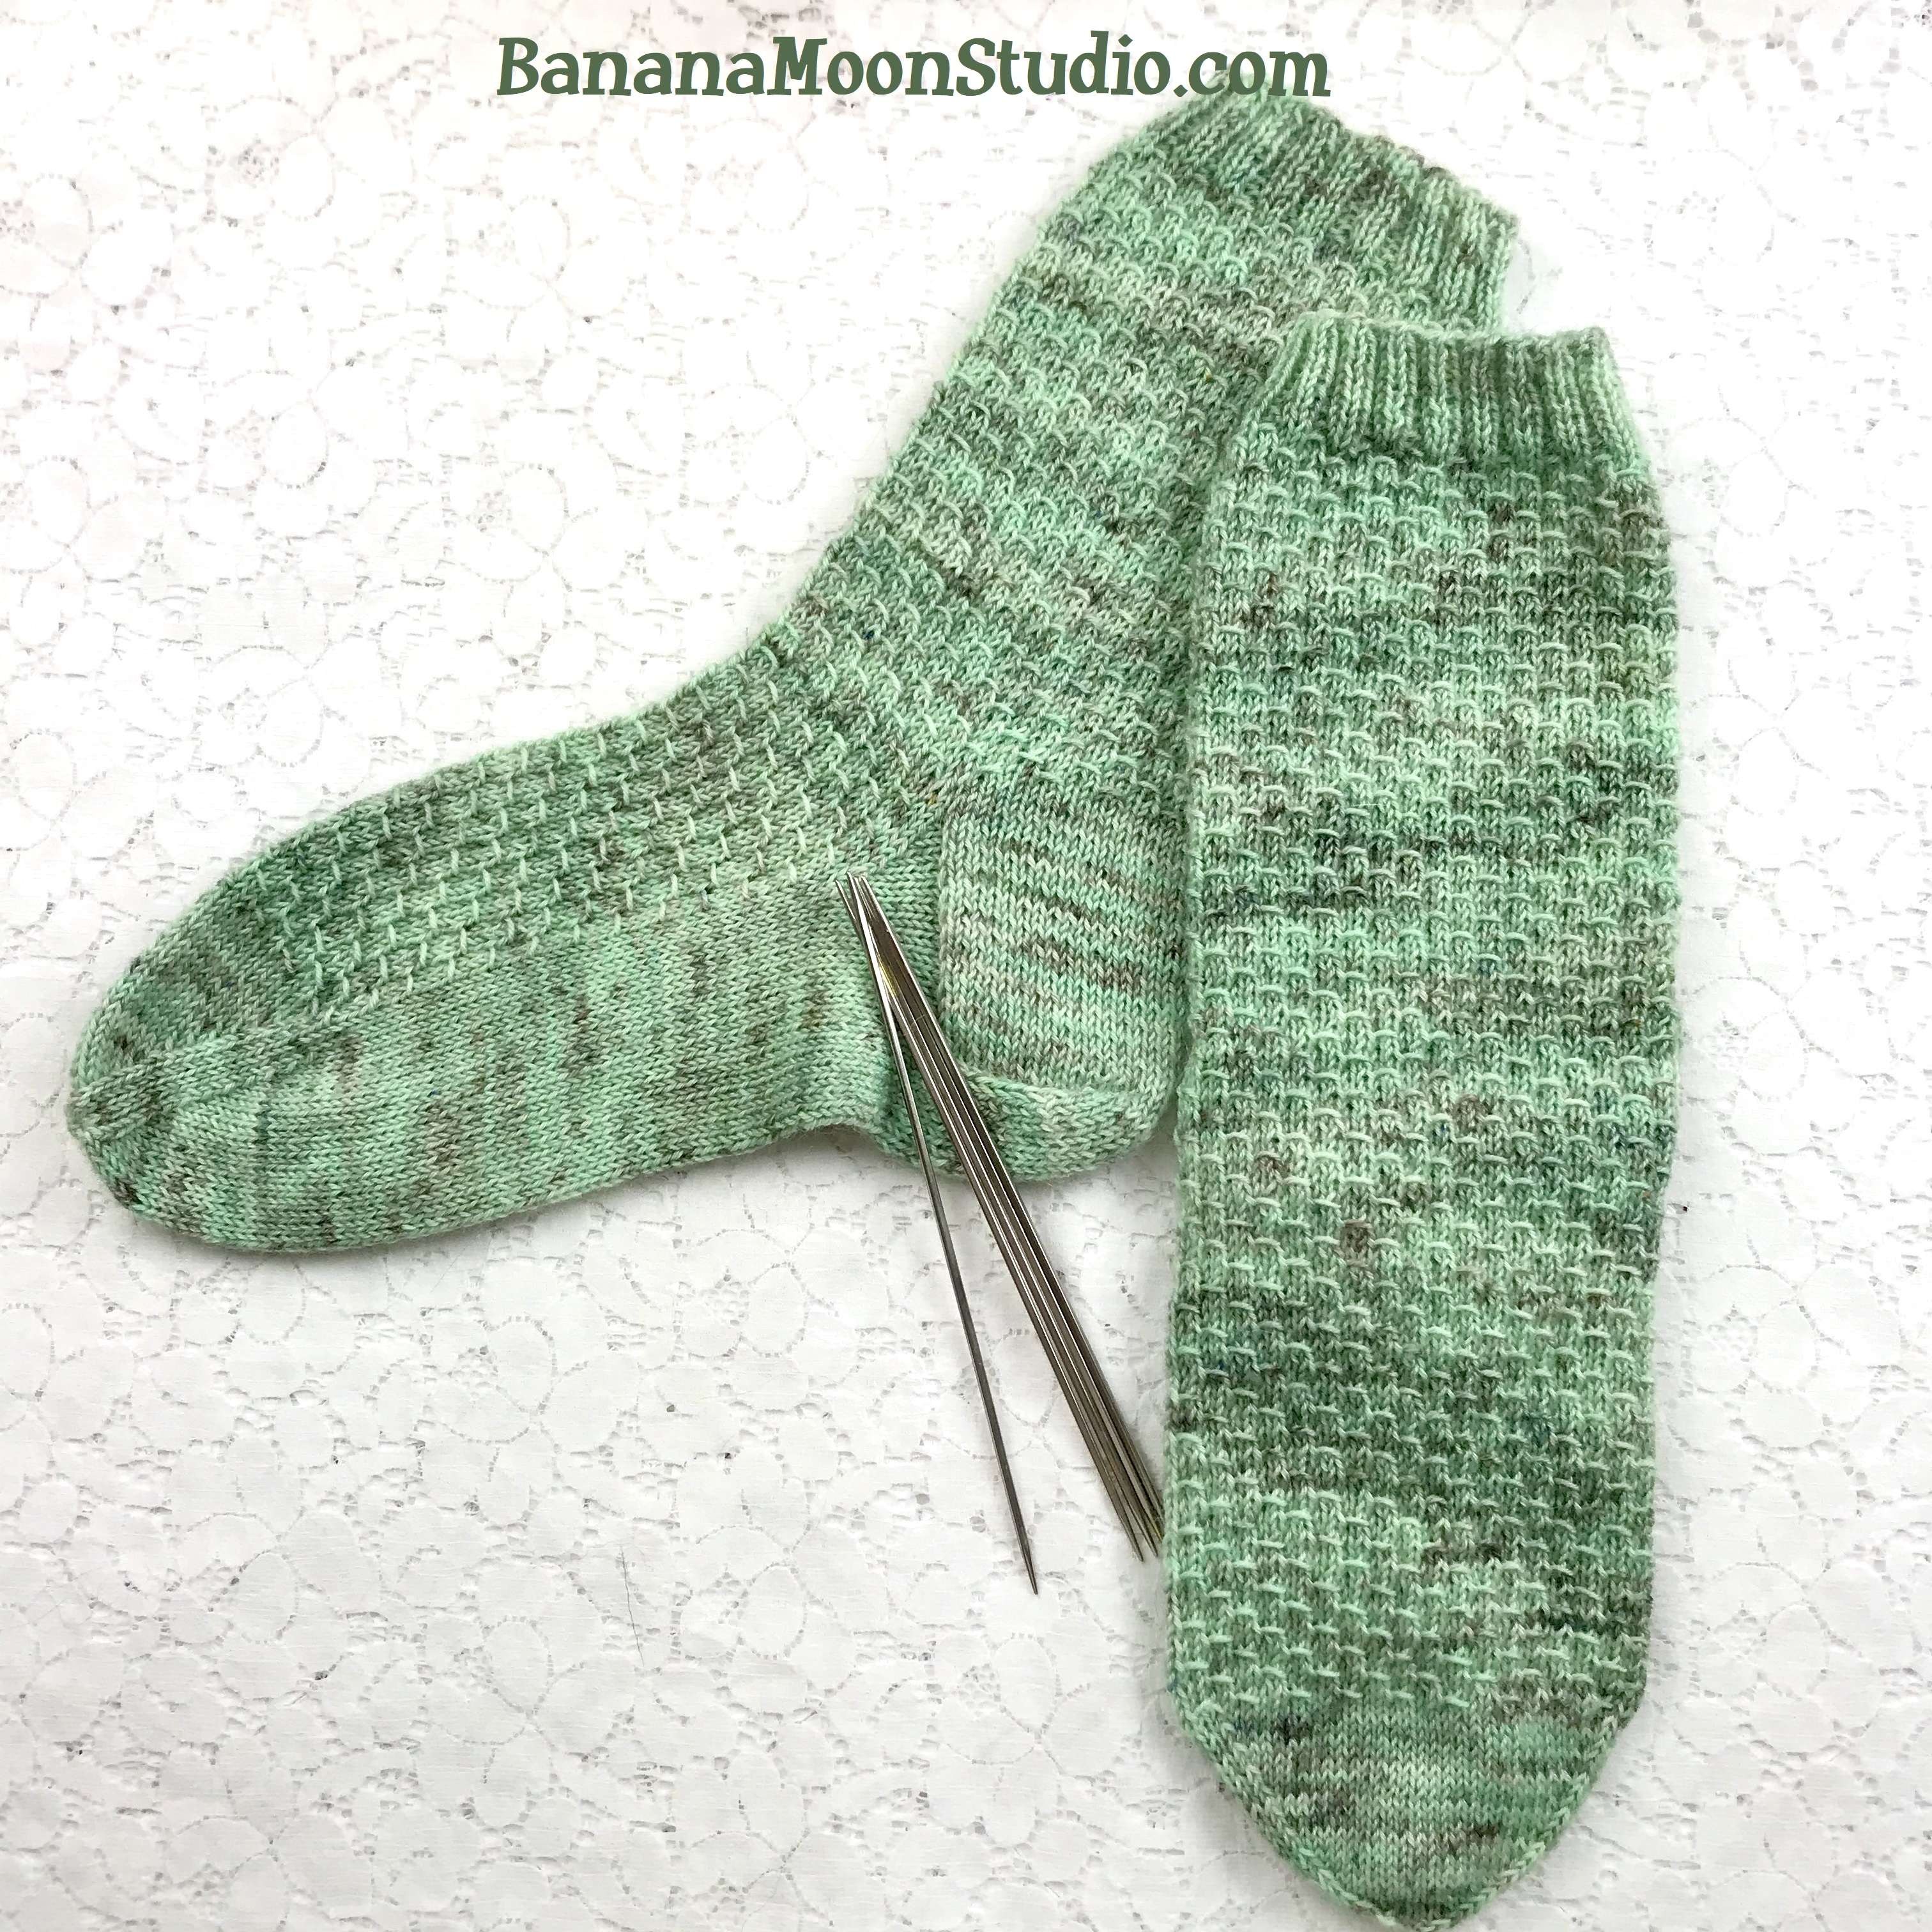 Free sock knitting pattern with tutorials from Banana Moon Studio #sockknitting #freesockknittingpattern